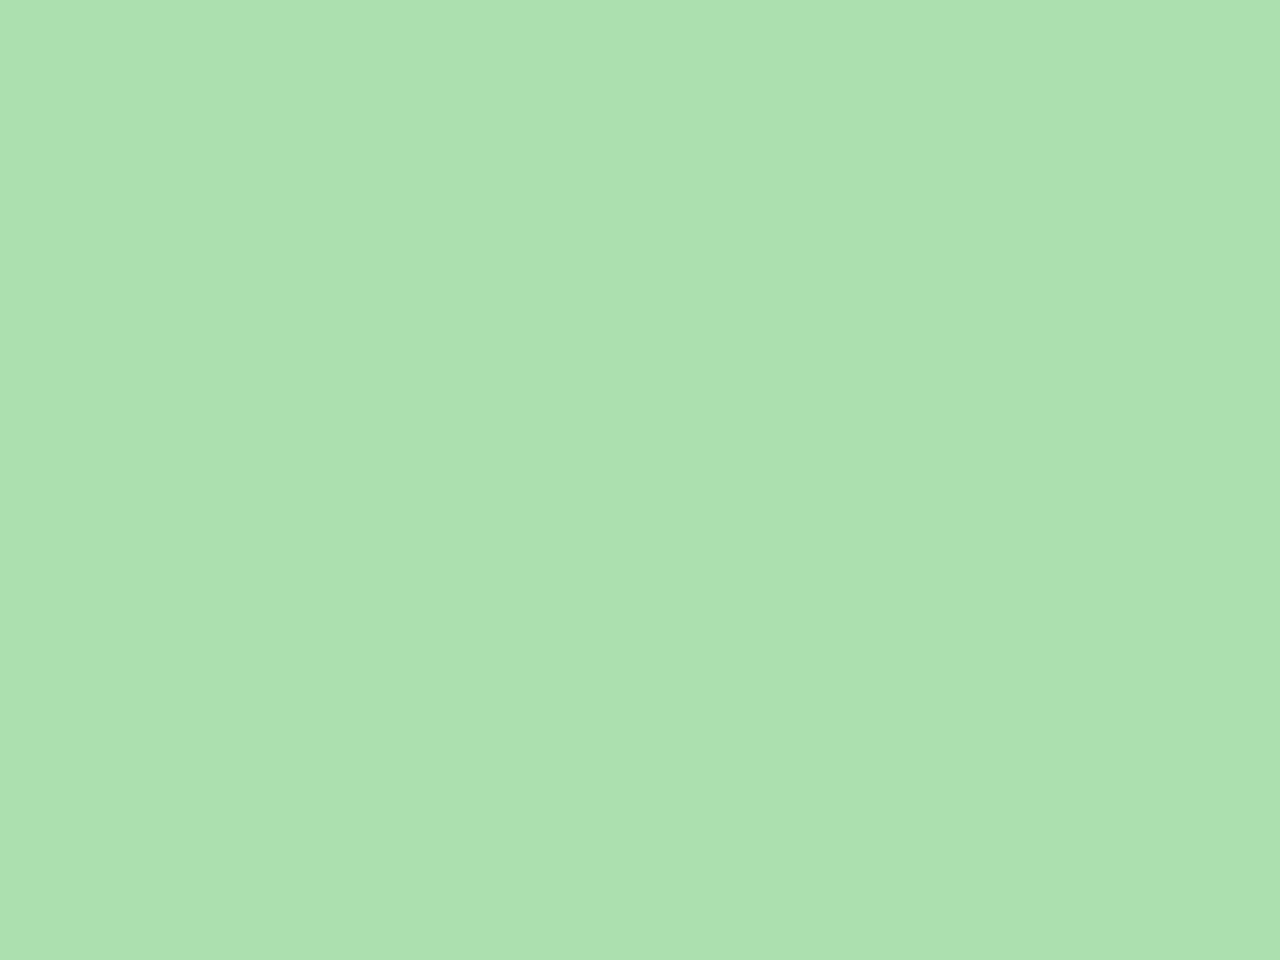 1280x960 Celadon Solid Color Background